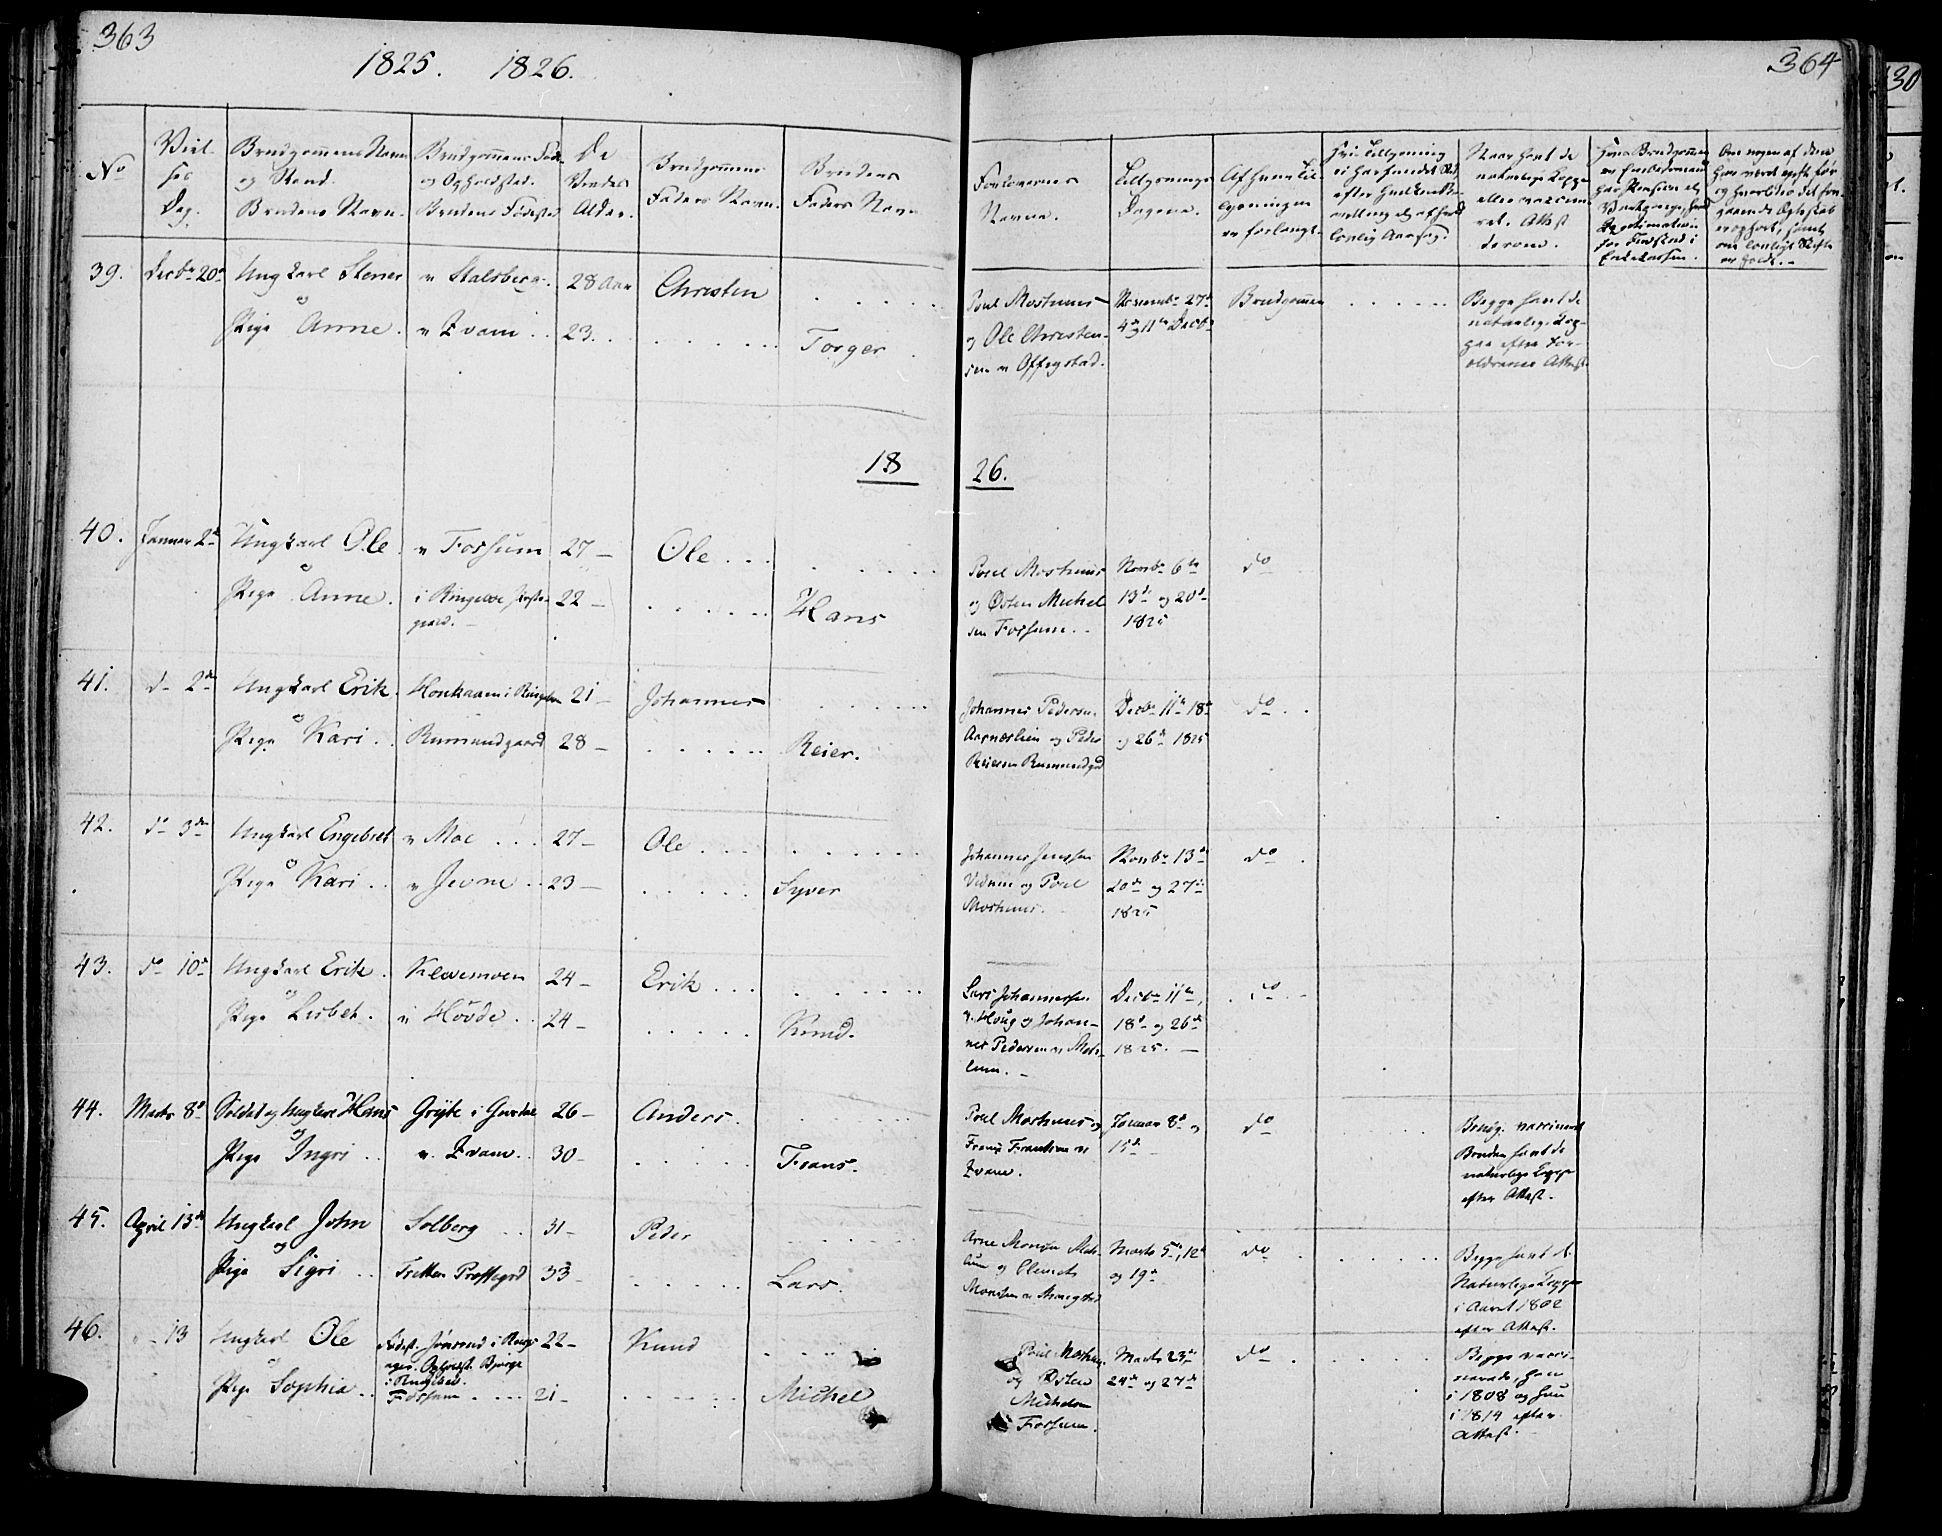 SAH, Øyer prestekontor, Ministerialbok nr. 4, 1824-1841, s. 363-364